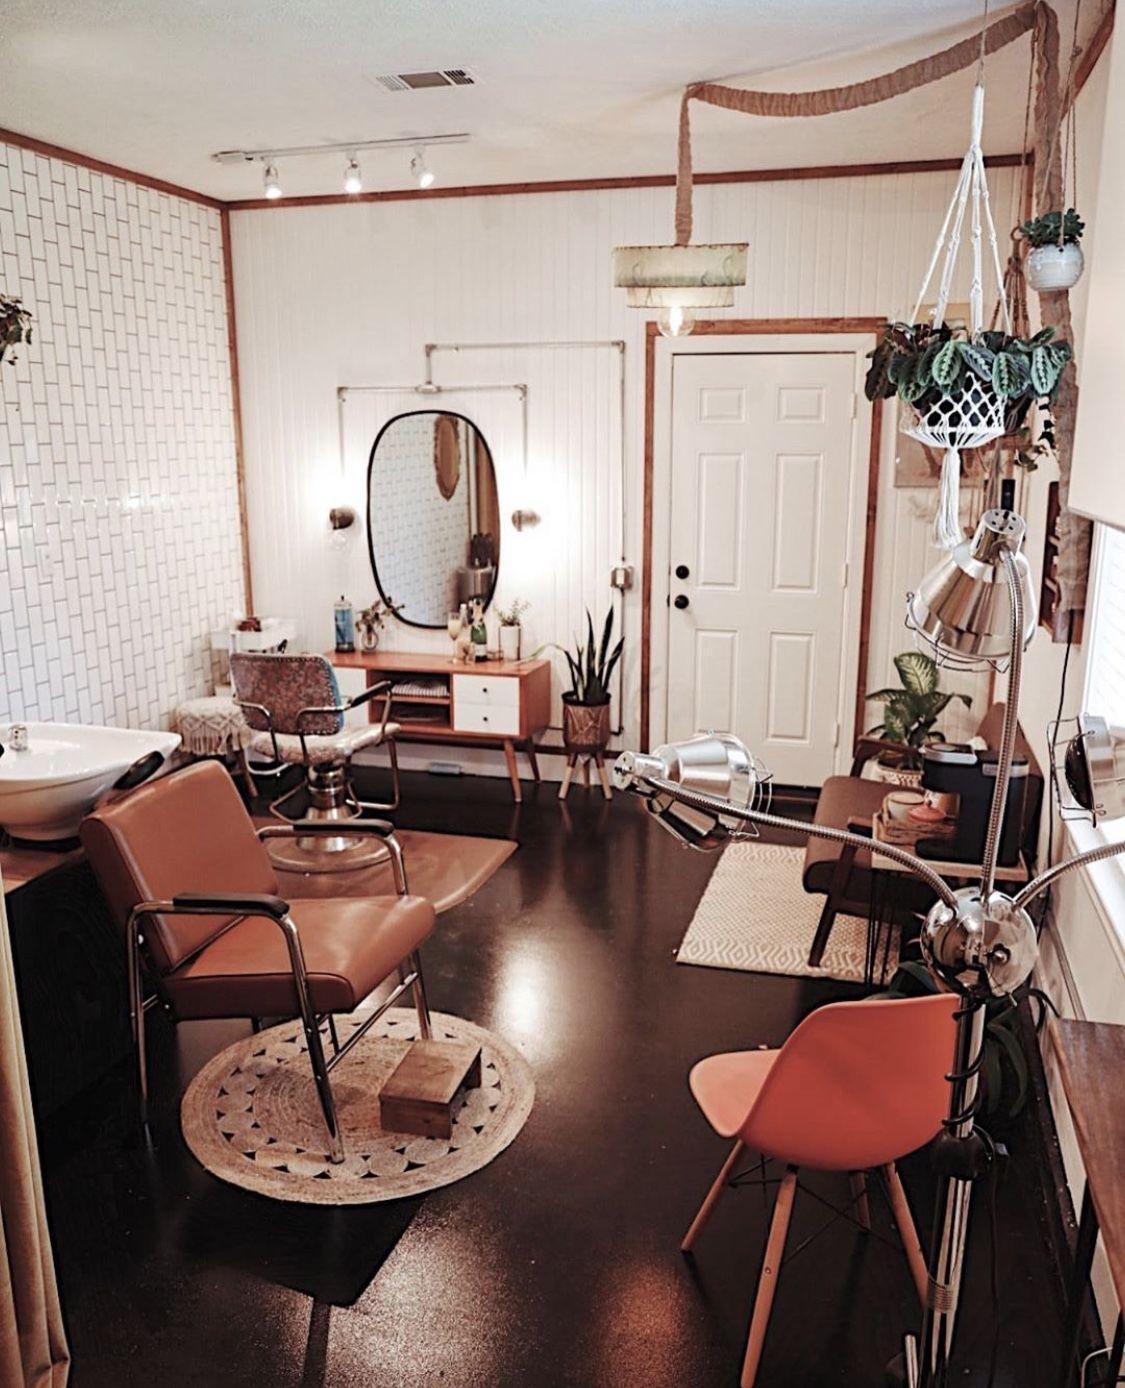 Blooming Maude Salon Myminerva Salon Suites Decor Home Hair Salons Home Beauty Salon